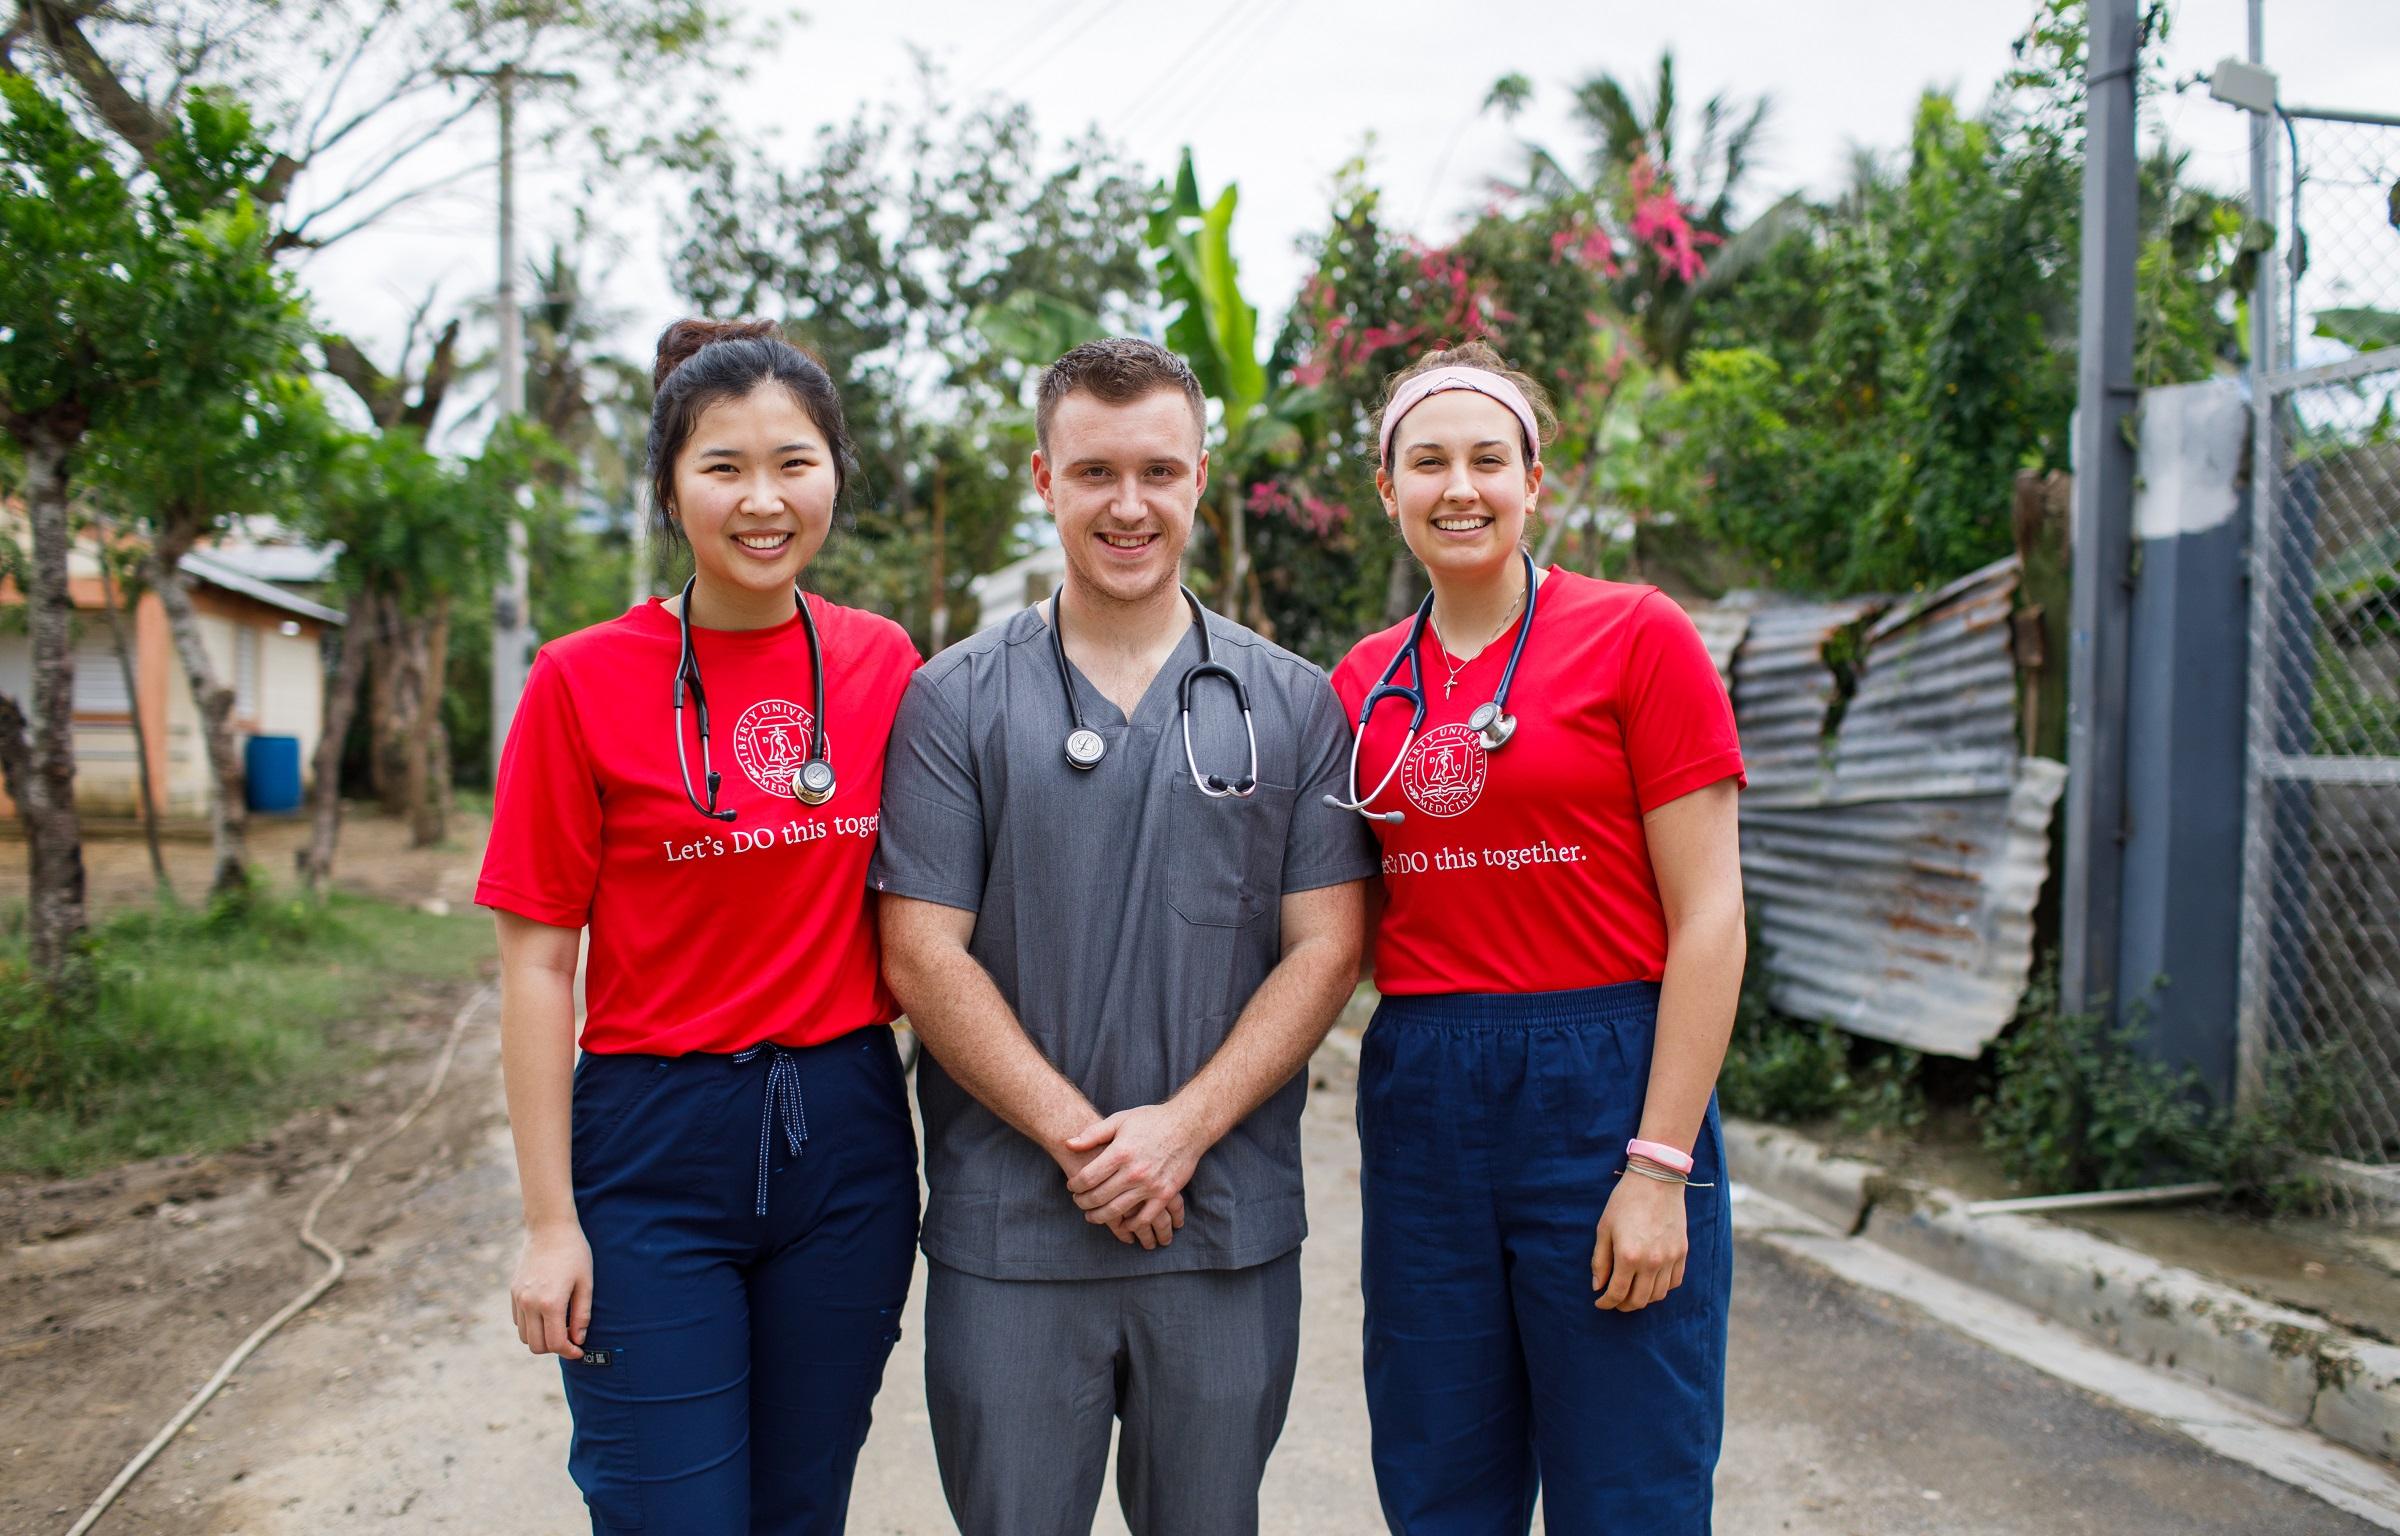 Global Health Certificate Program Online